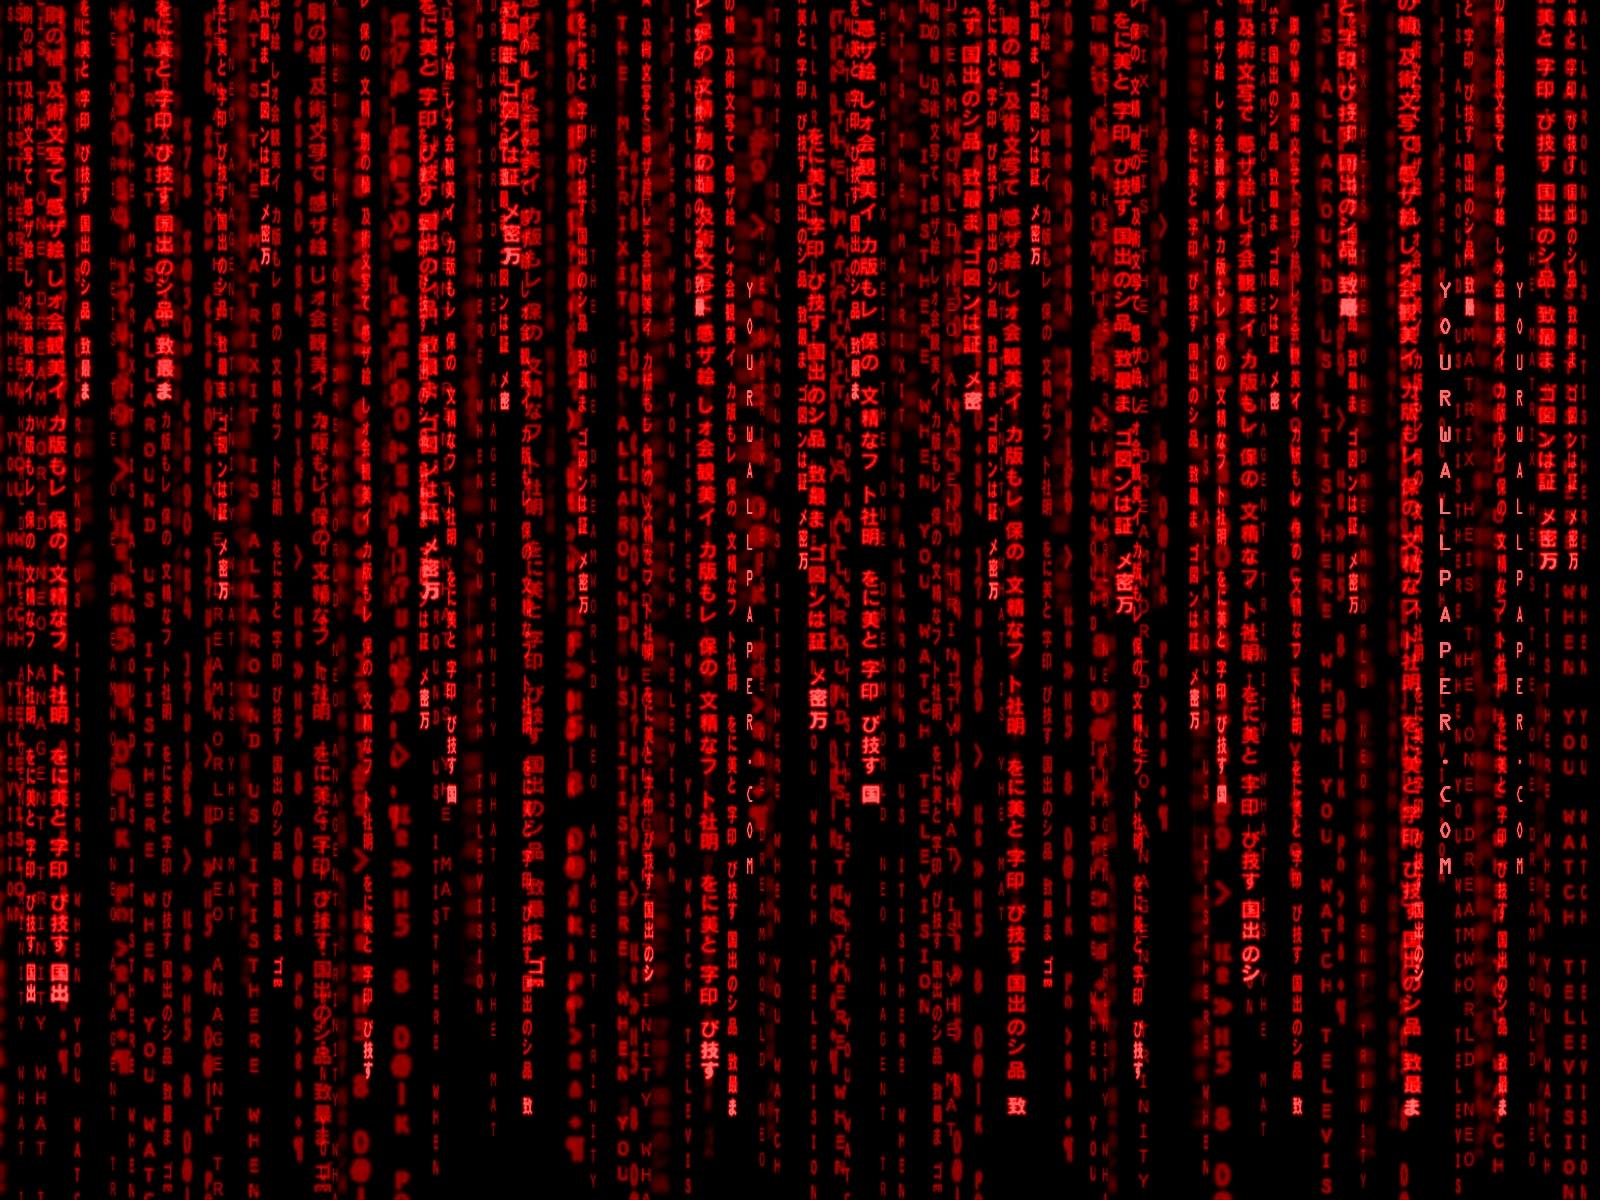 binary wallpaper wallpapersafari - photo #24